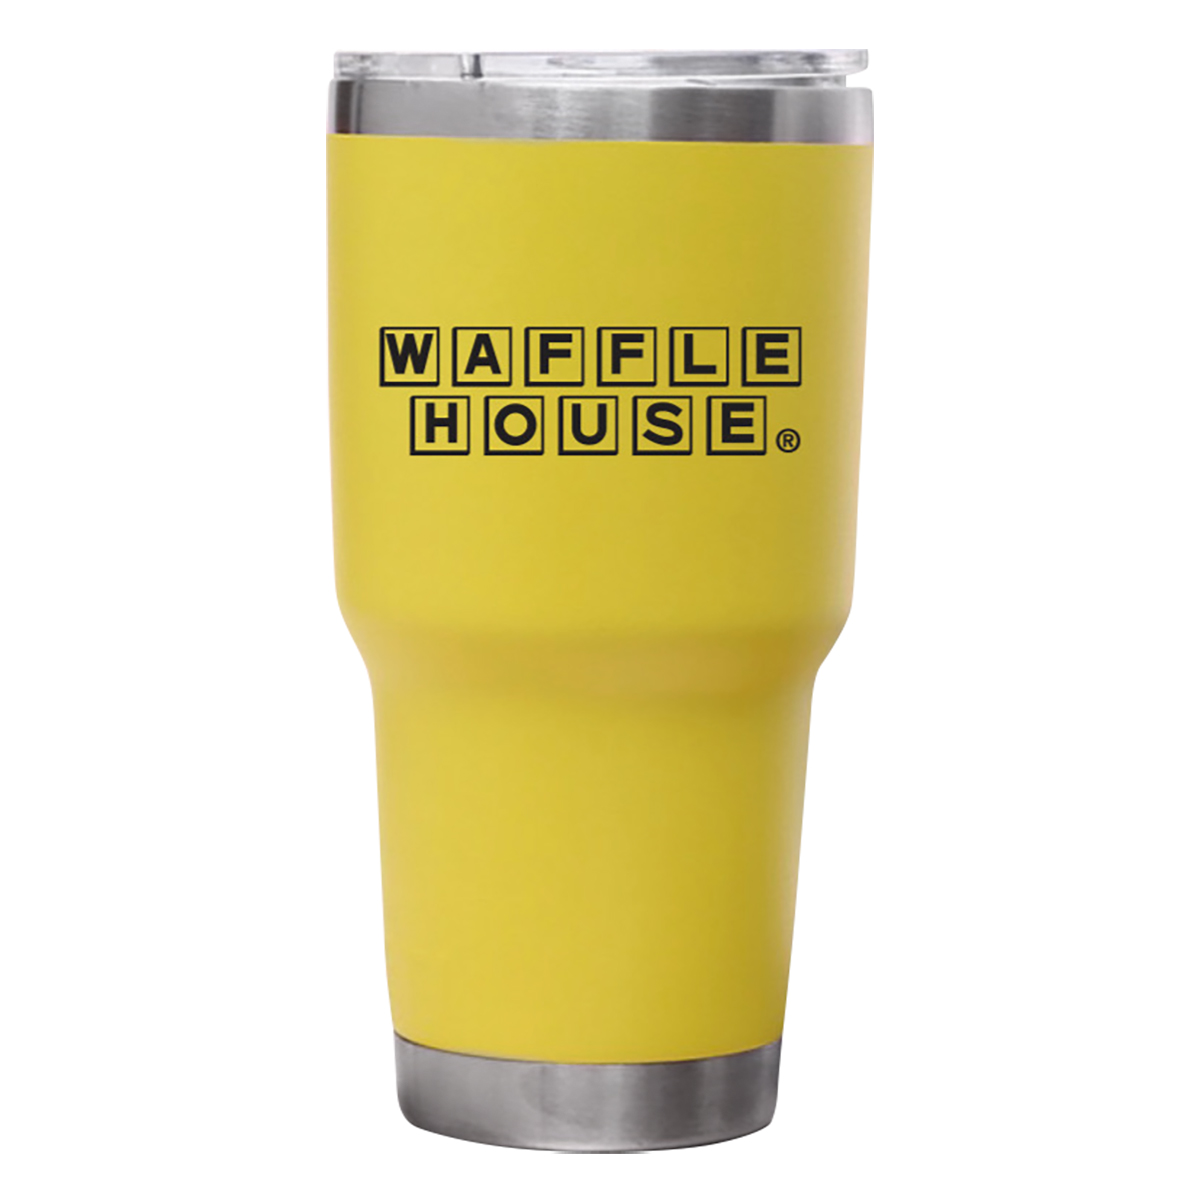 Jeff Gordon Children's Foundation / Waffle House Tumbler